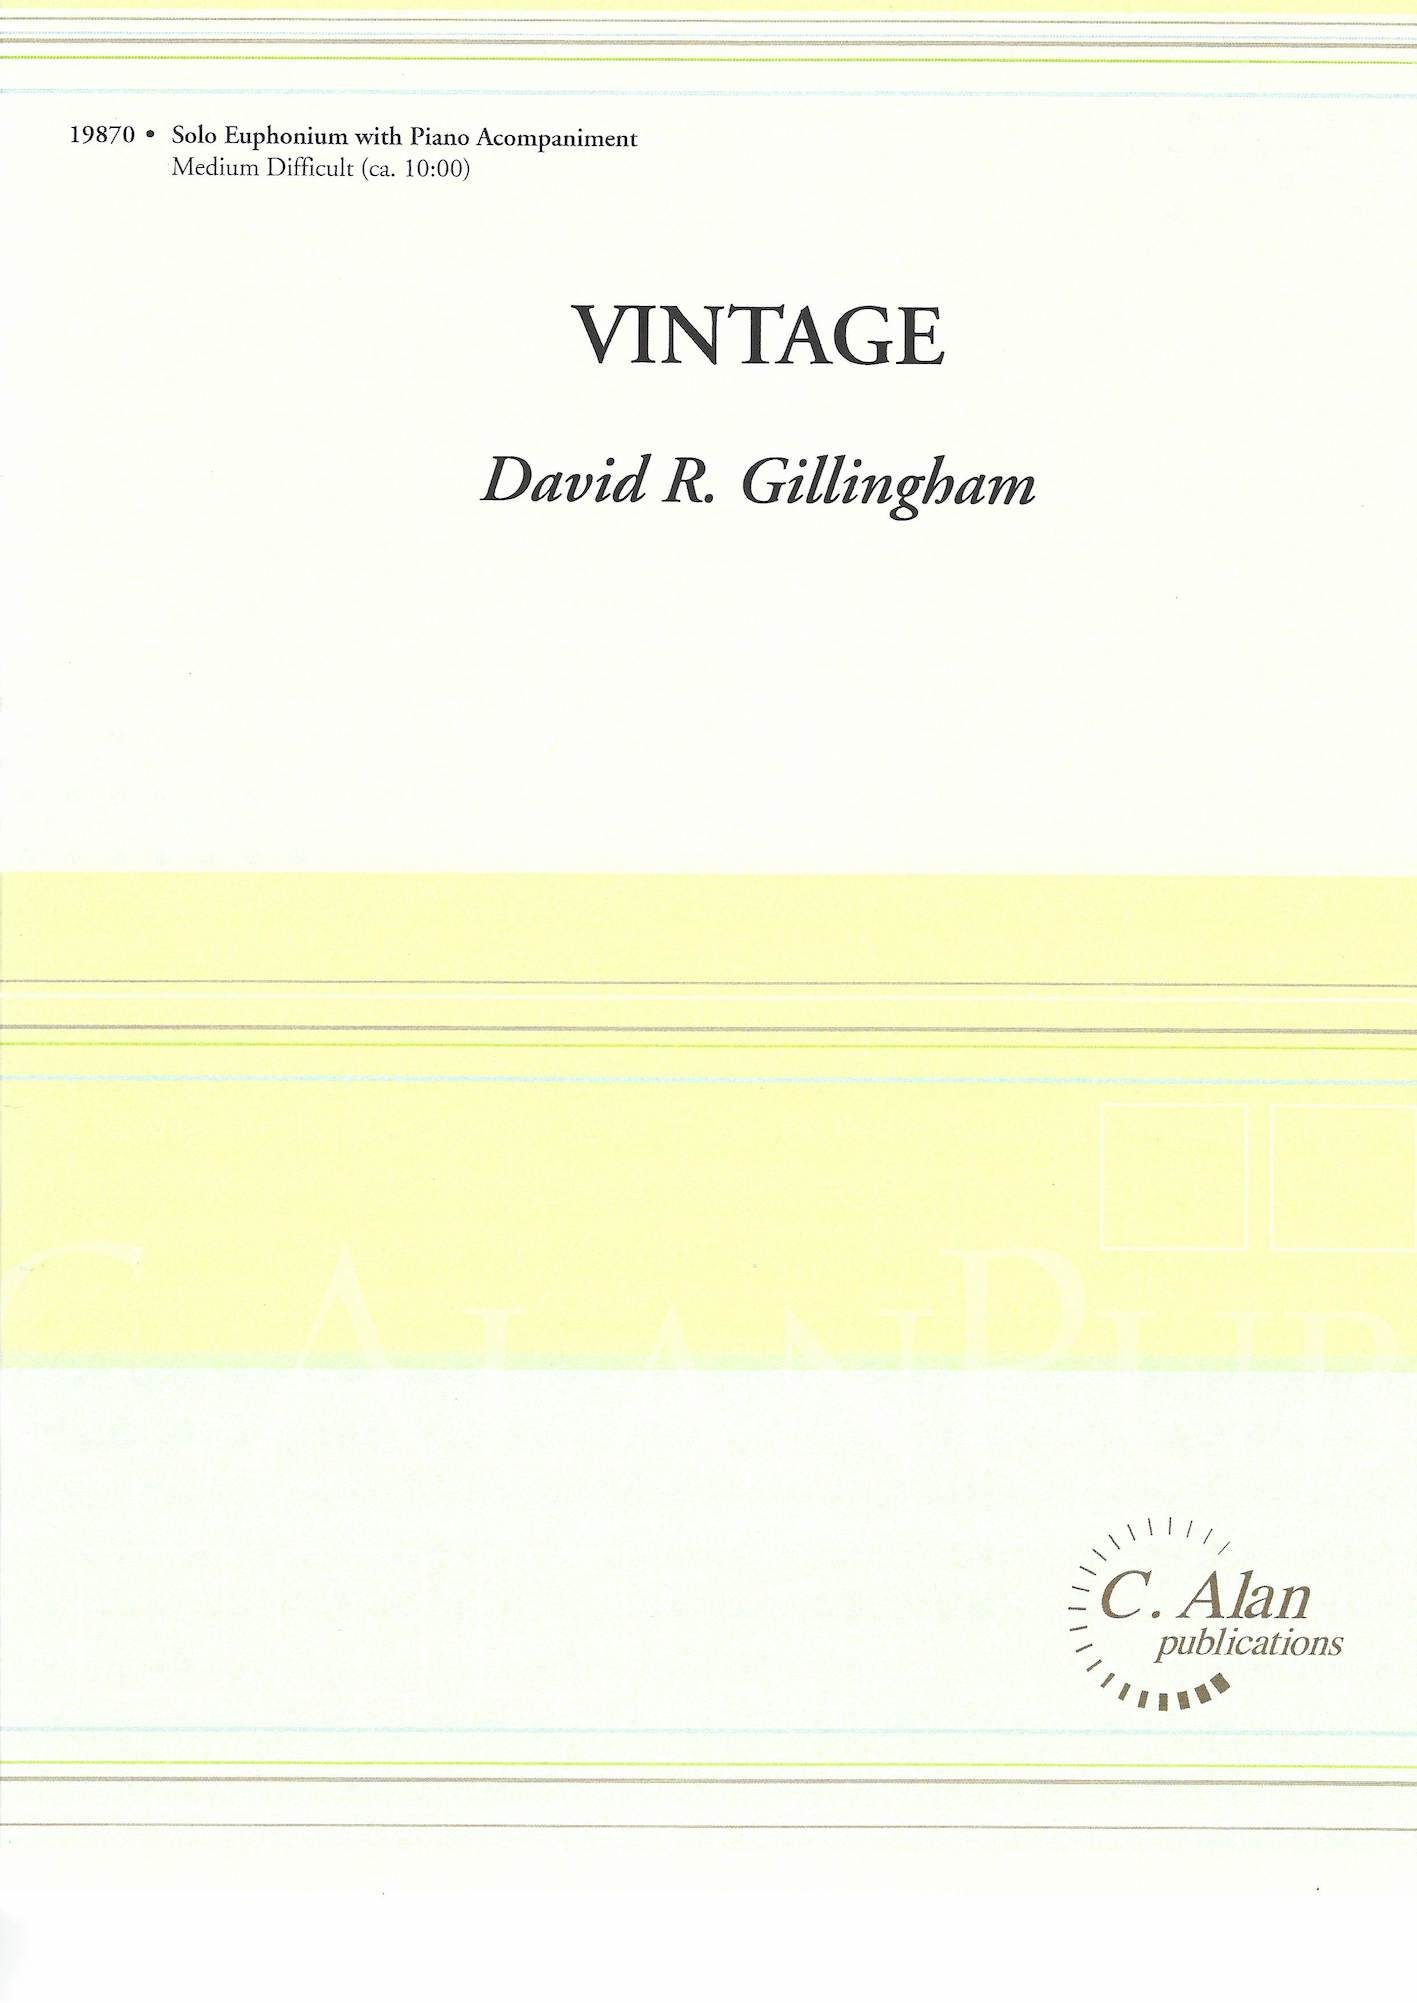 Vintage - David Gillingham - Euphonium and Piano